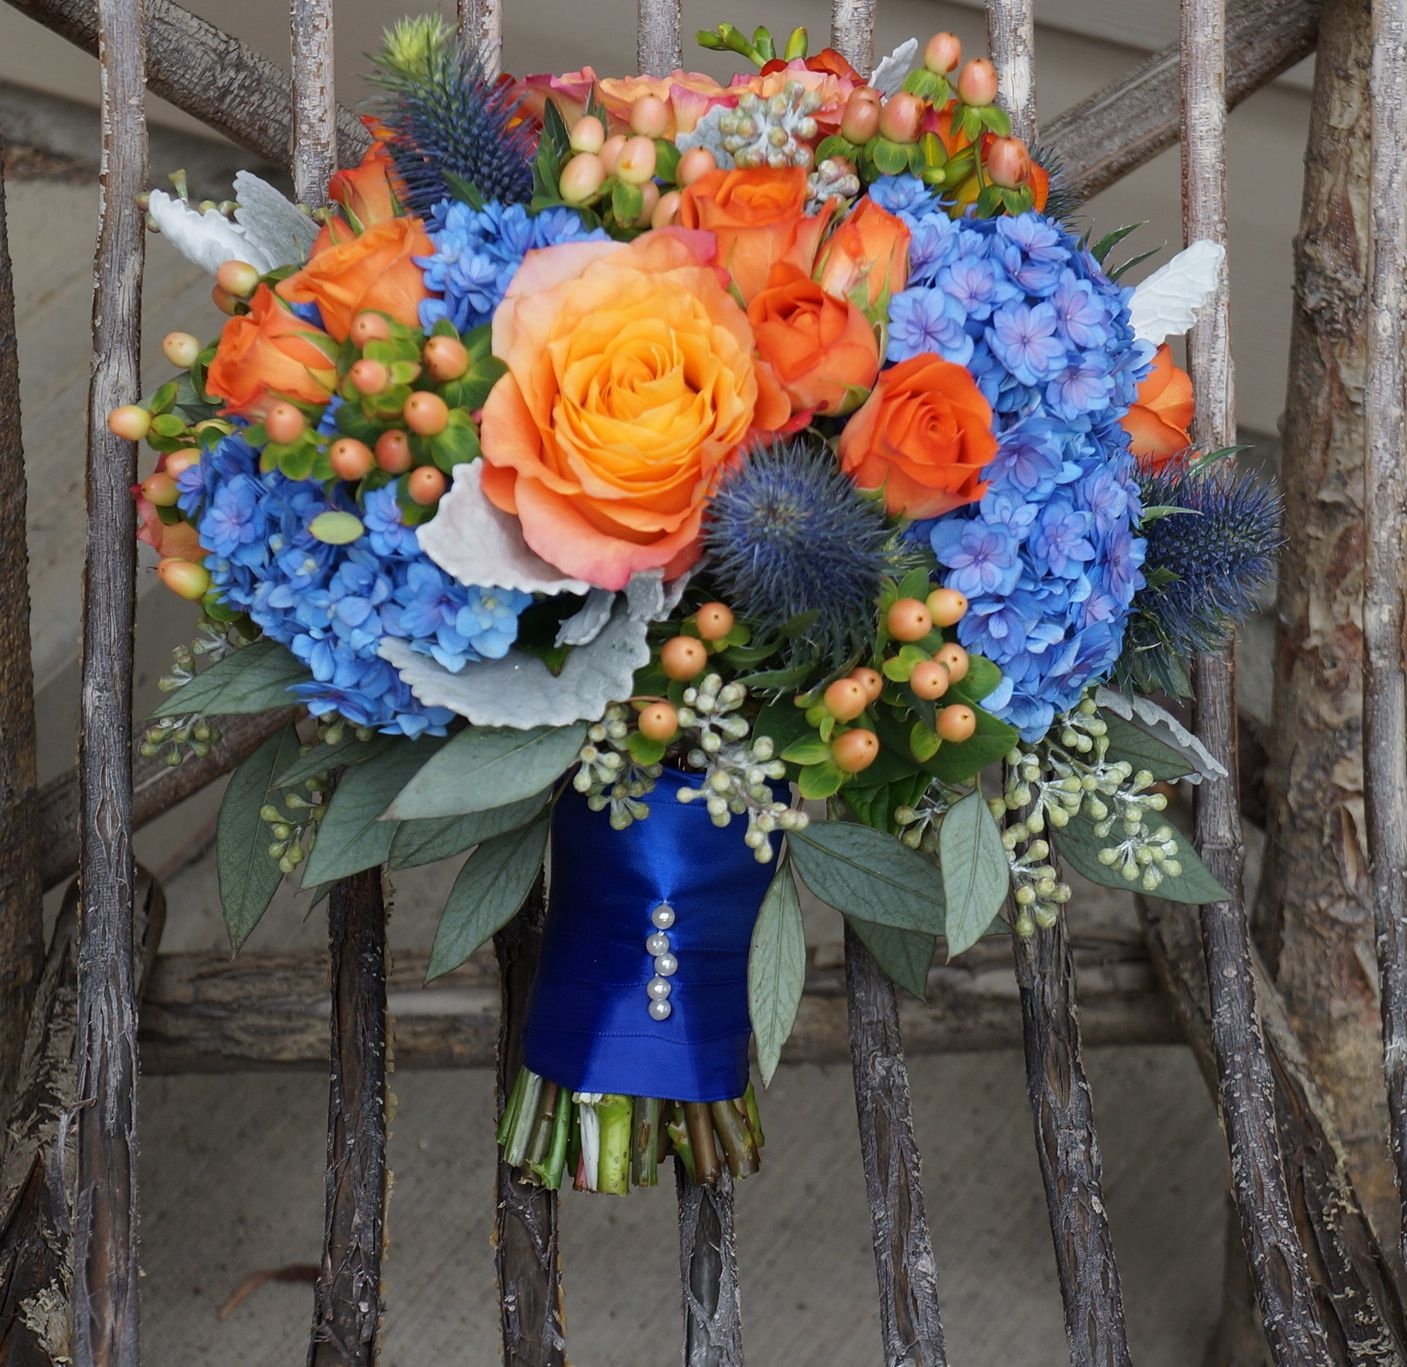 Orange Flower Arrangements For Weddings: I Had So Much Fun Designing This Blue, Orange And Peach